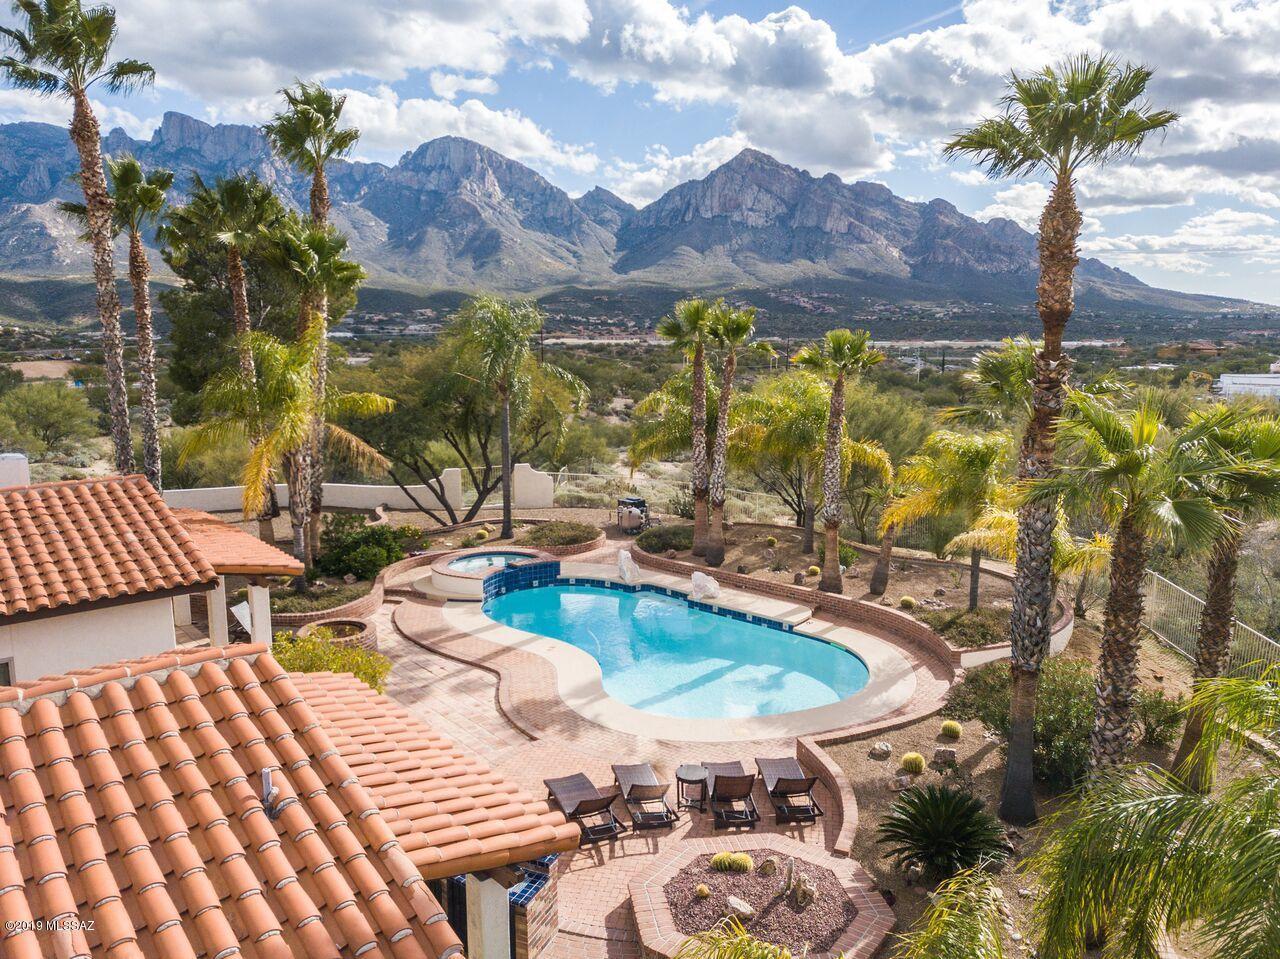 Photo of 11355 N 1St (FIRST) Avenue, Tucson, AZ 85737